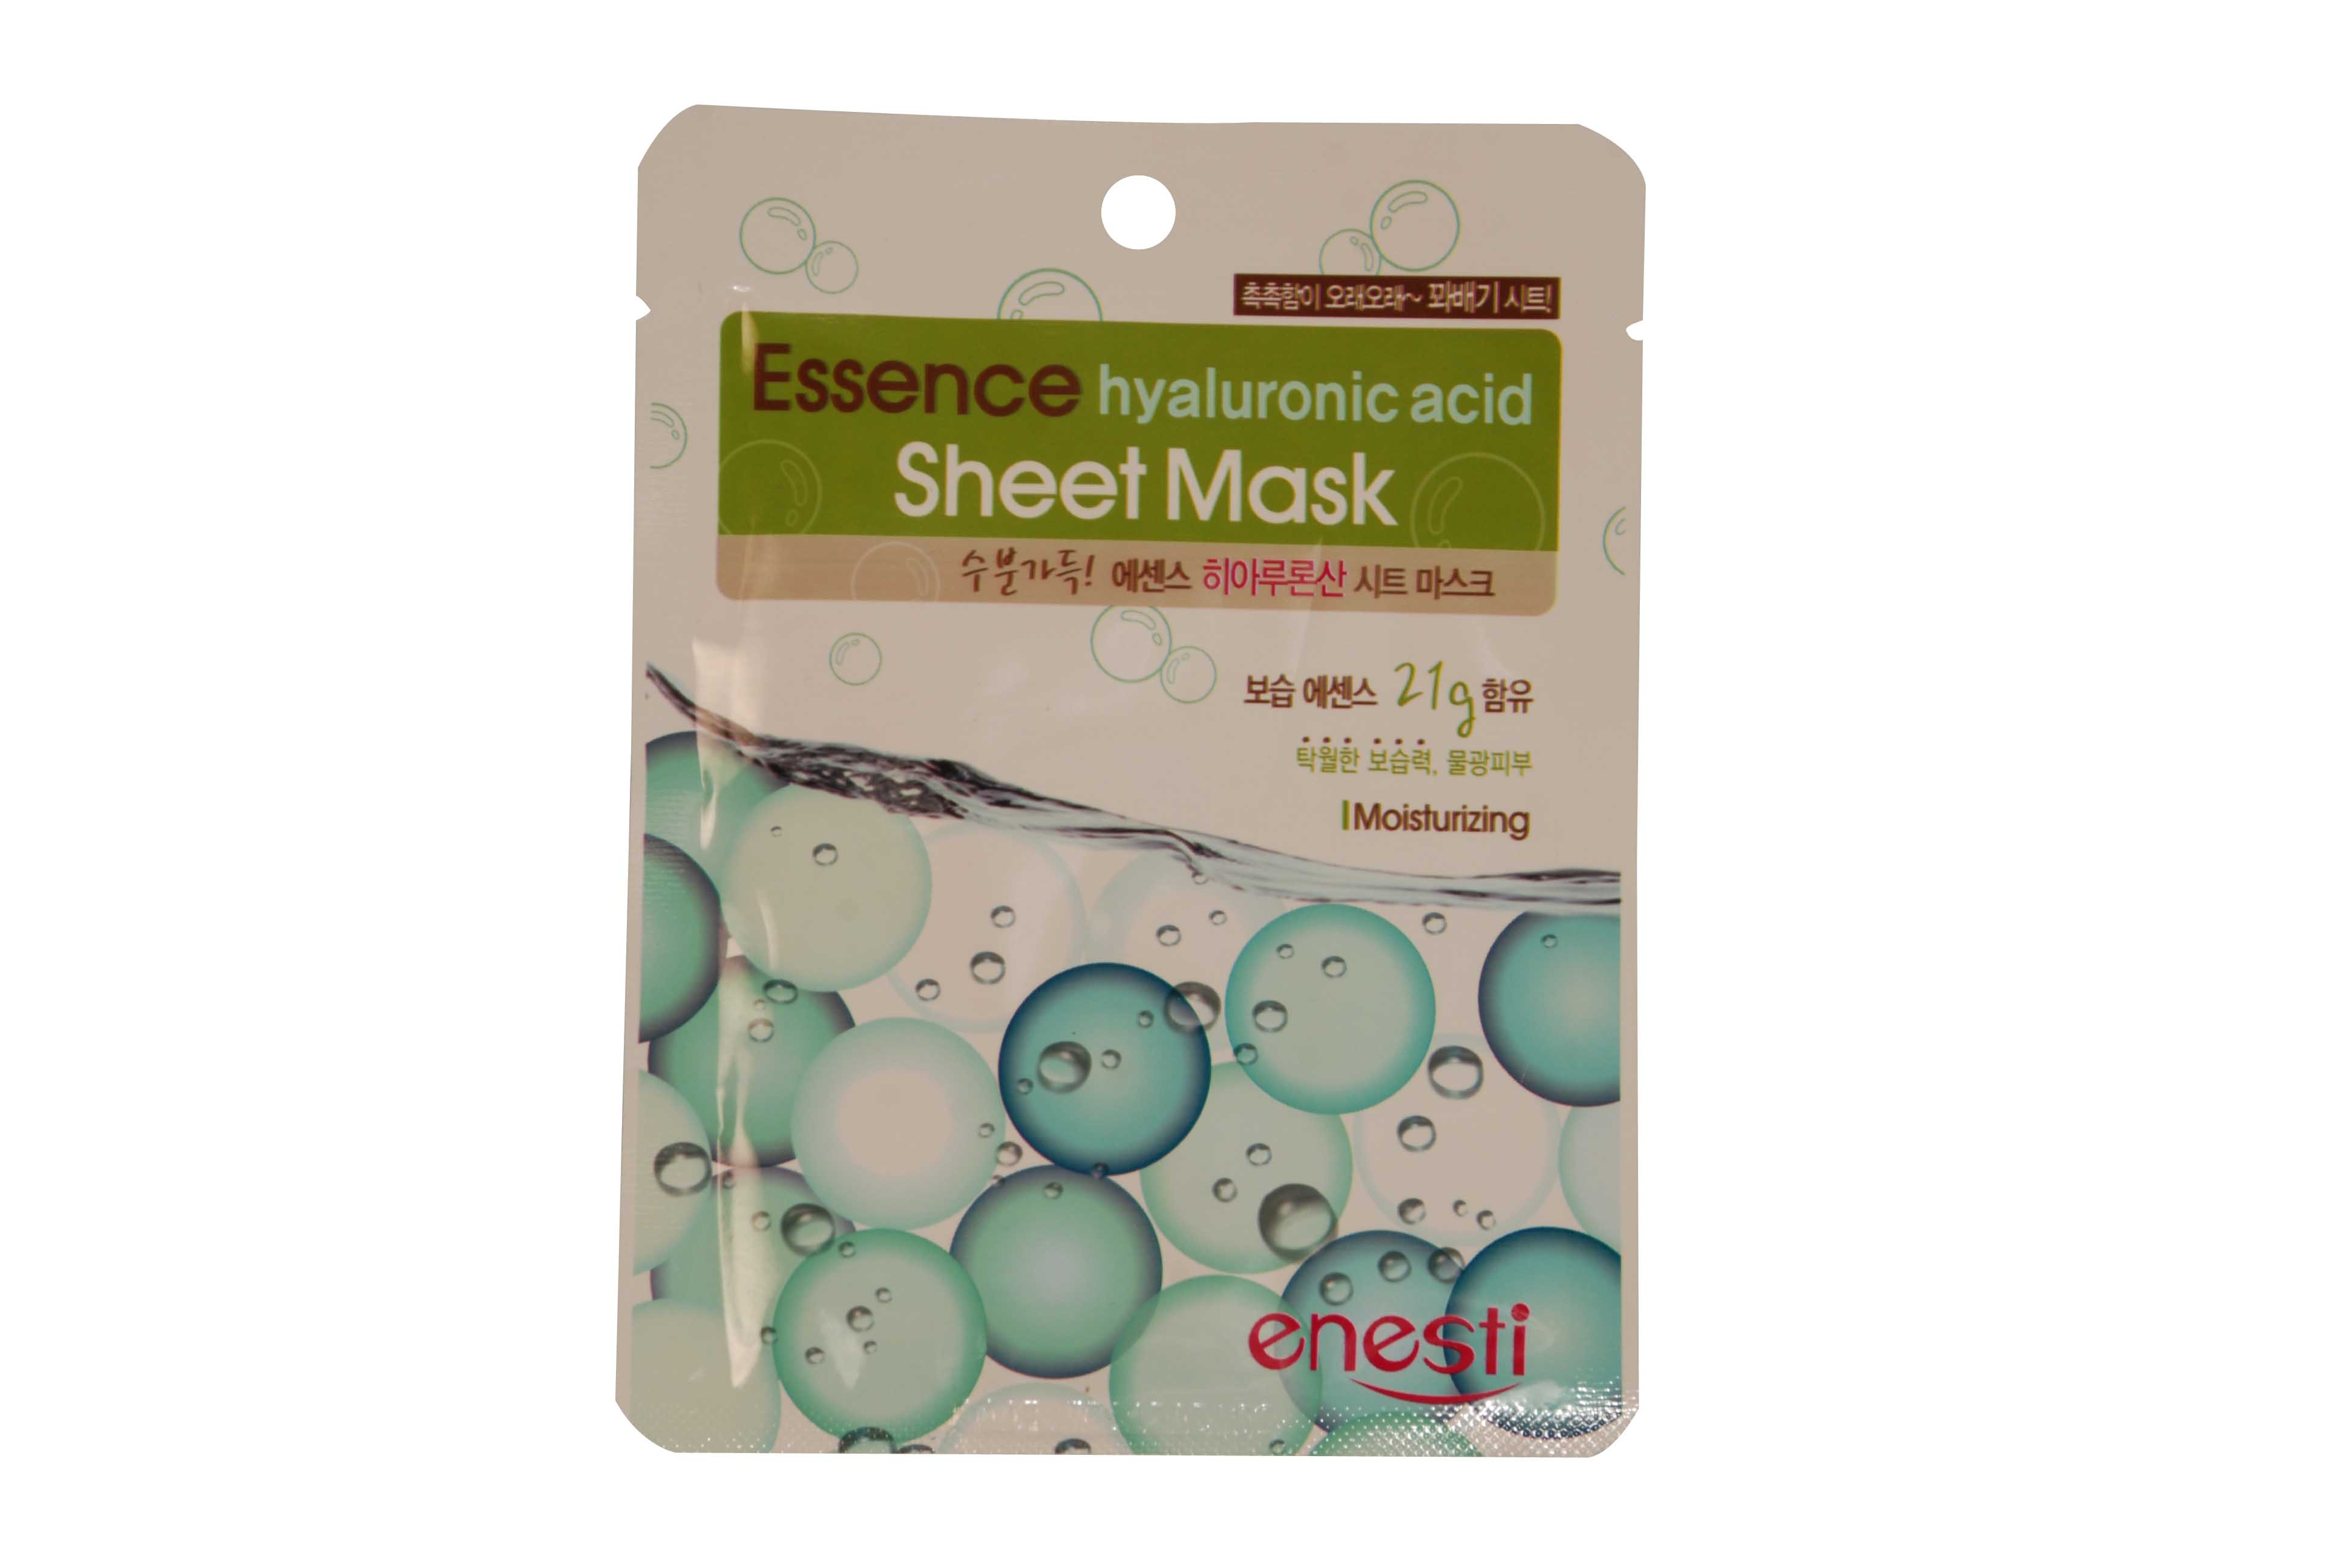 Essence Sheet Mask: Hyaluronic Acid